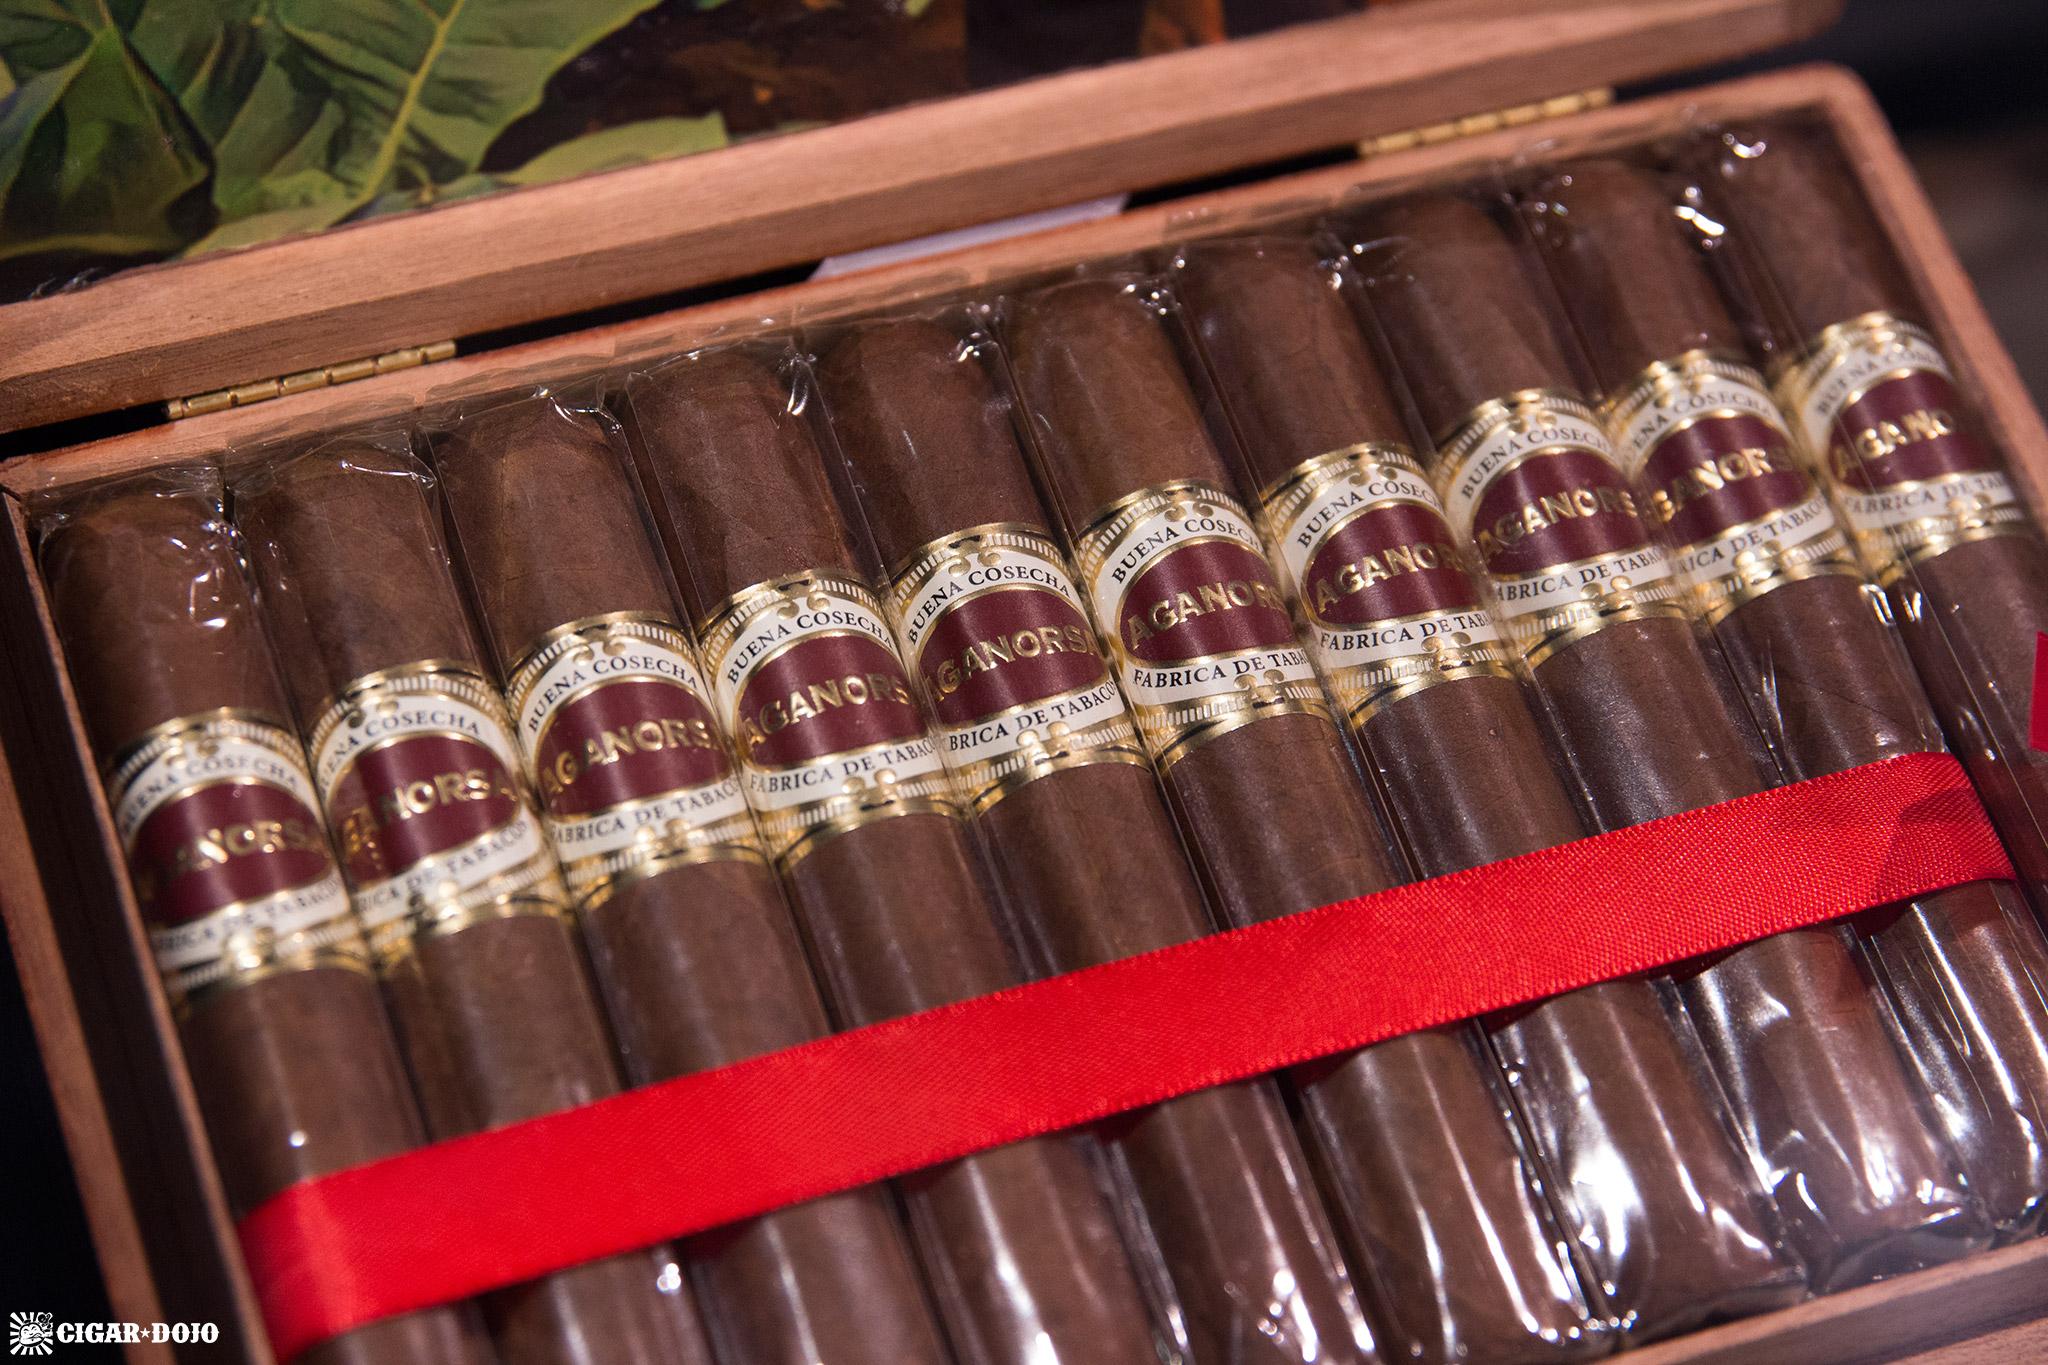 Aganorsa Leaf Buena Cosecha cigars IPCPR 2018